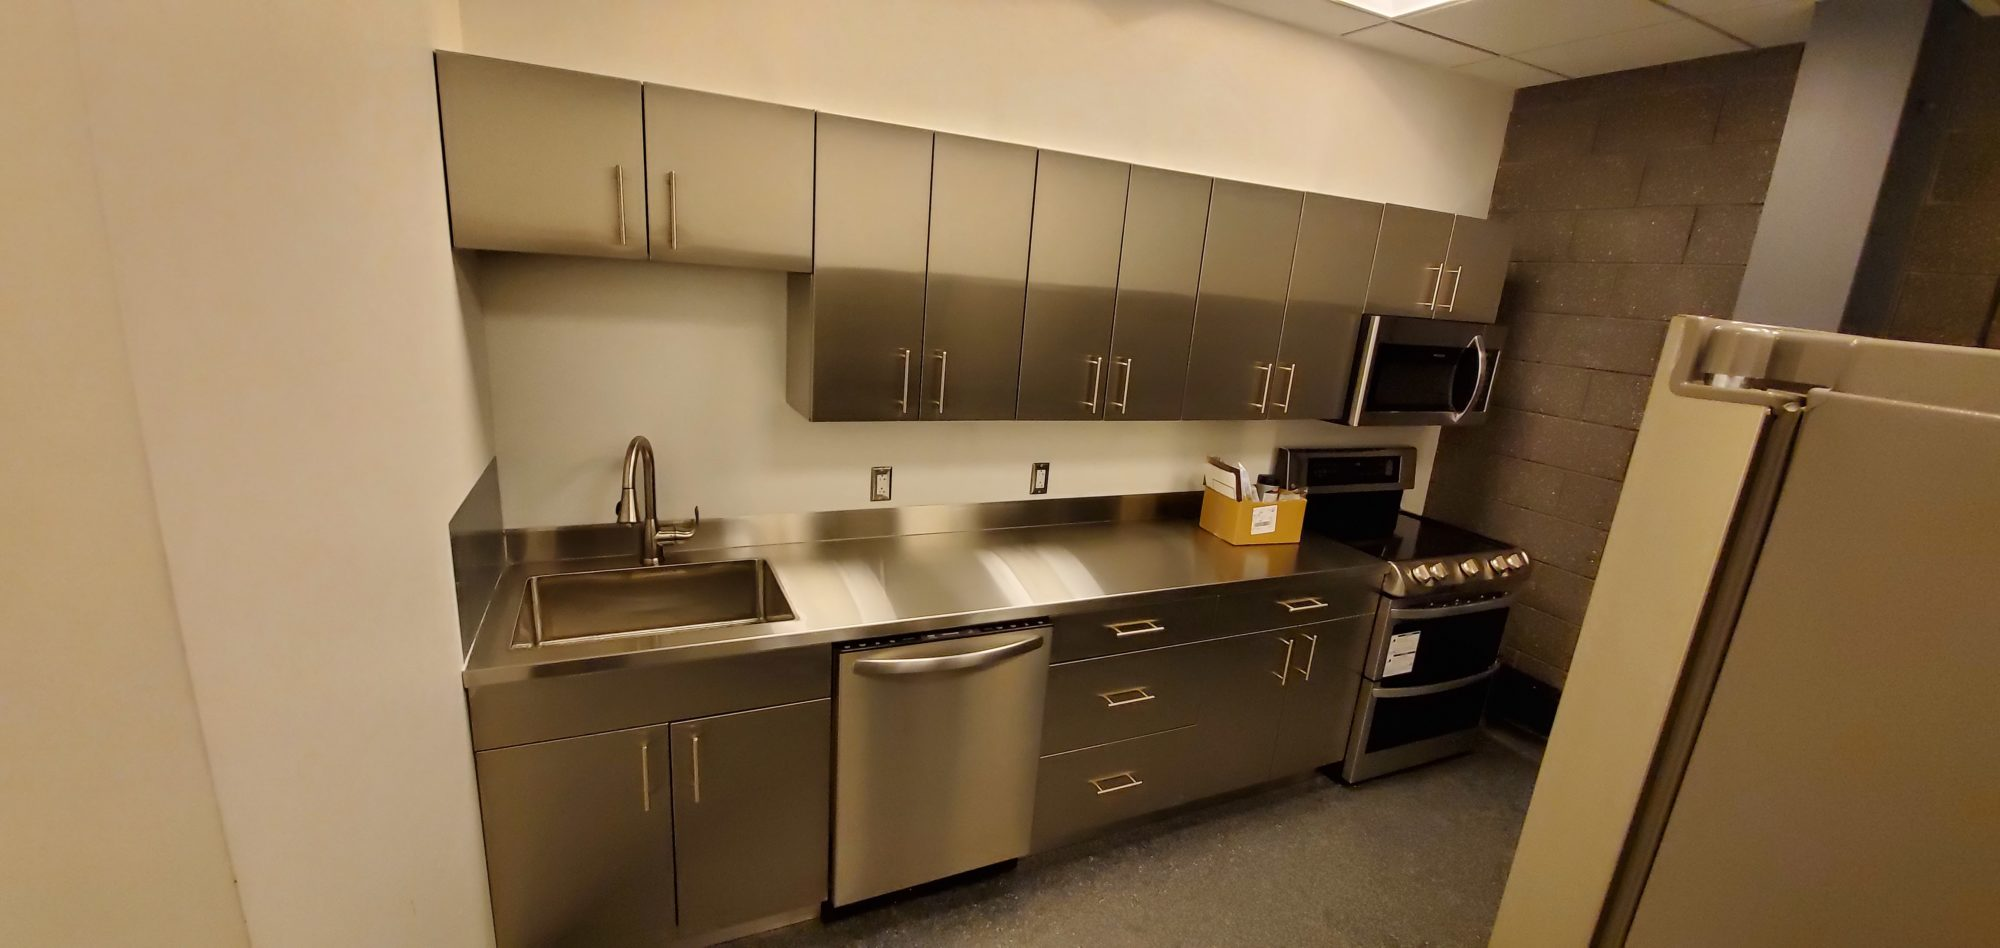 Stainless Steel commercial kitchen cabinets.   SteelKitchen